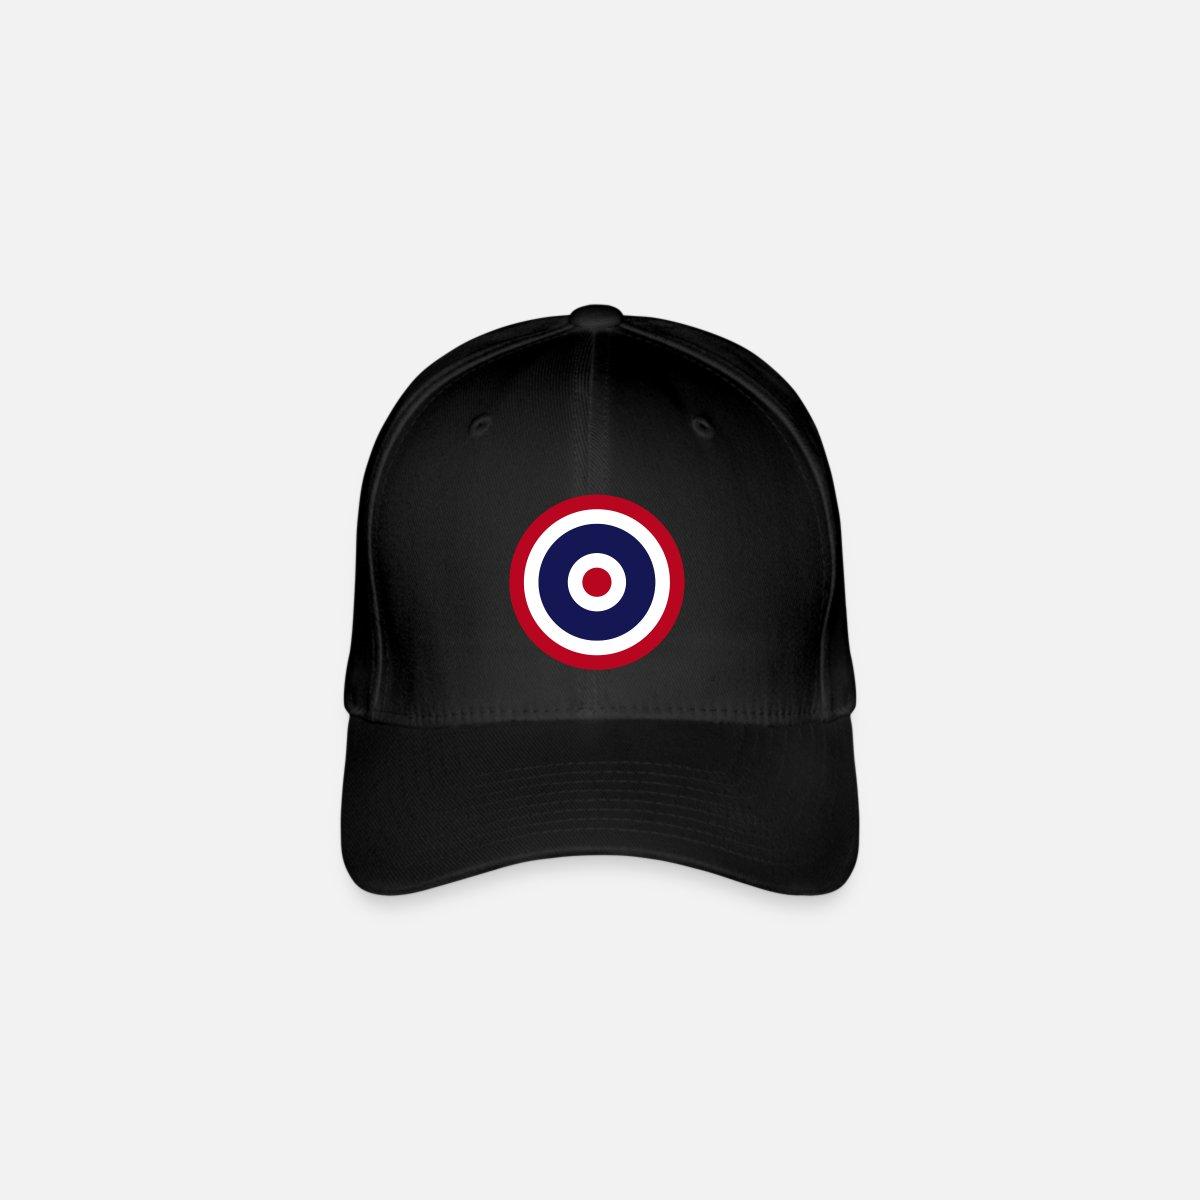 6f9a9d71d58 Thai Roundel Target Flag Flexfit Baseball Cap